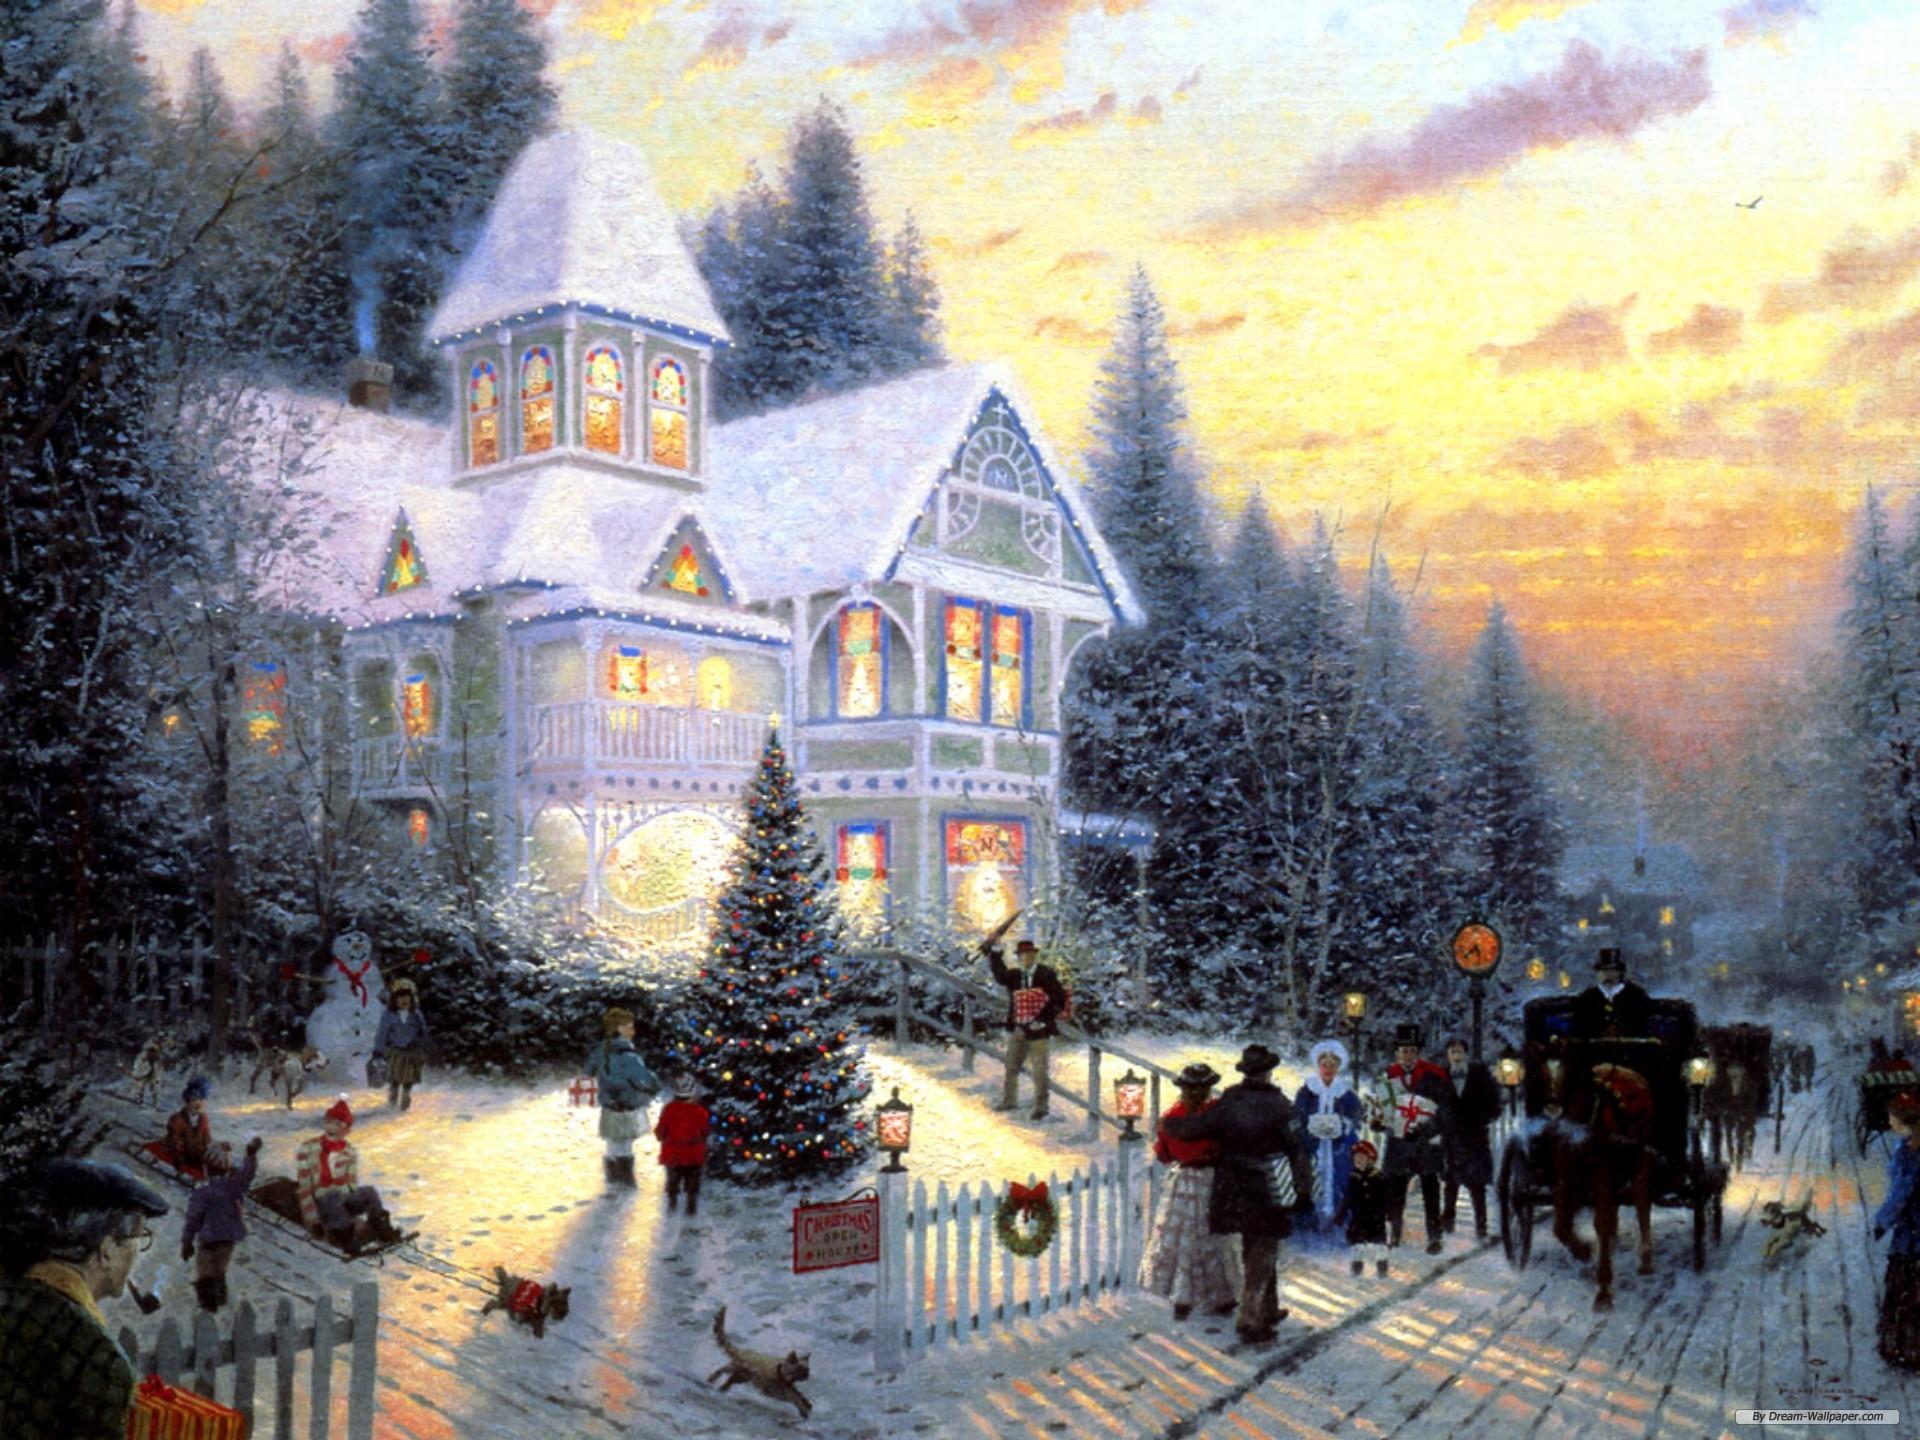 50] Christmas Desktop Holiday Wallpaper on WallpaperSafari 1920x1440